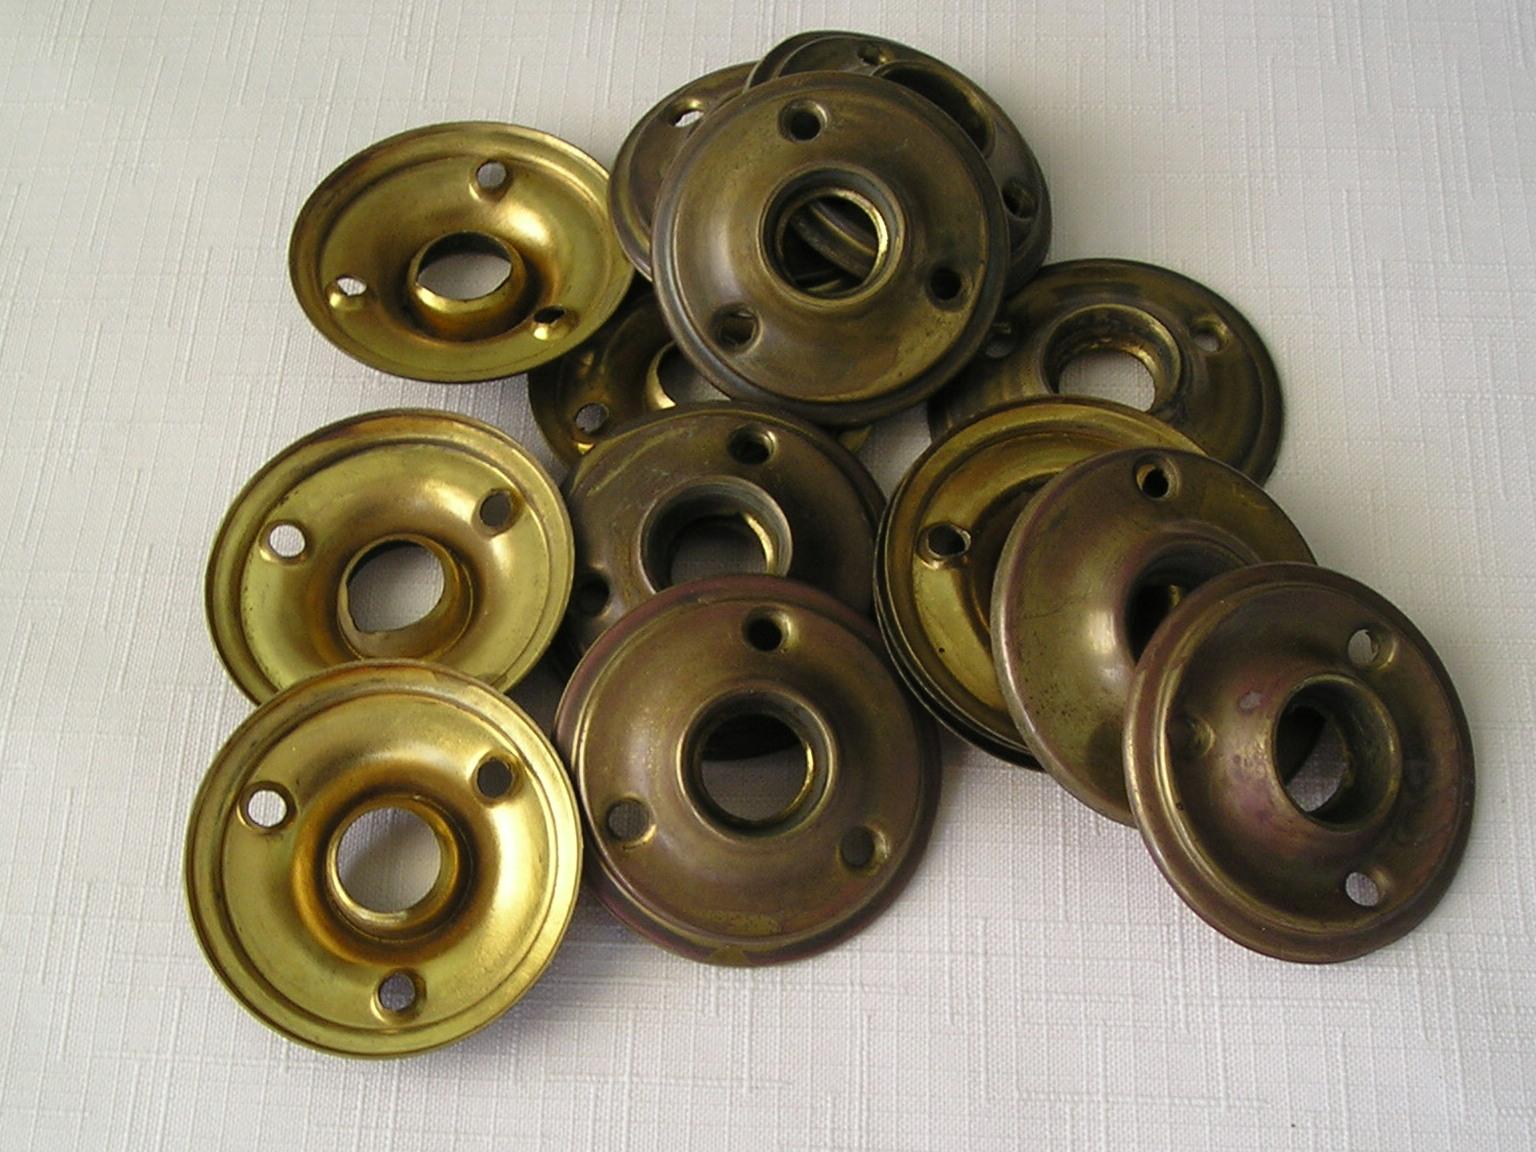 Brass Door Rosettes & Brass Door Rosettes | ND MillWerk Salvage and Sales